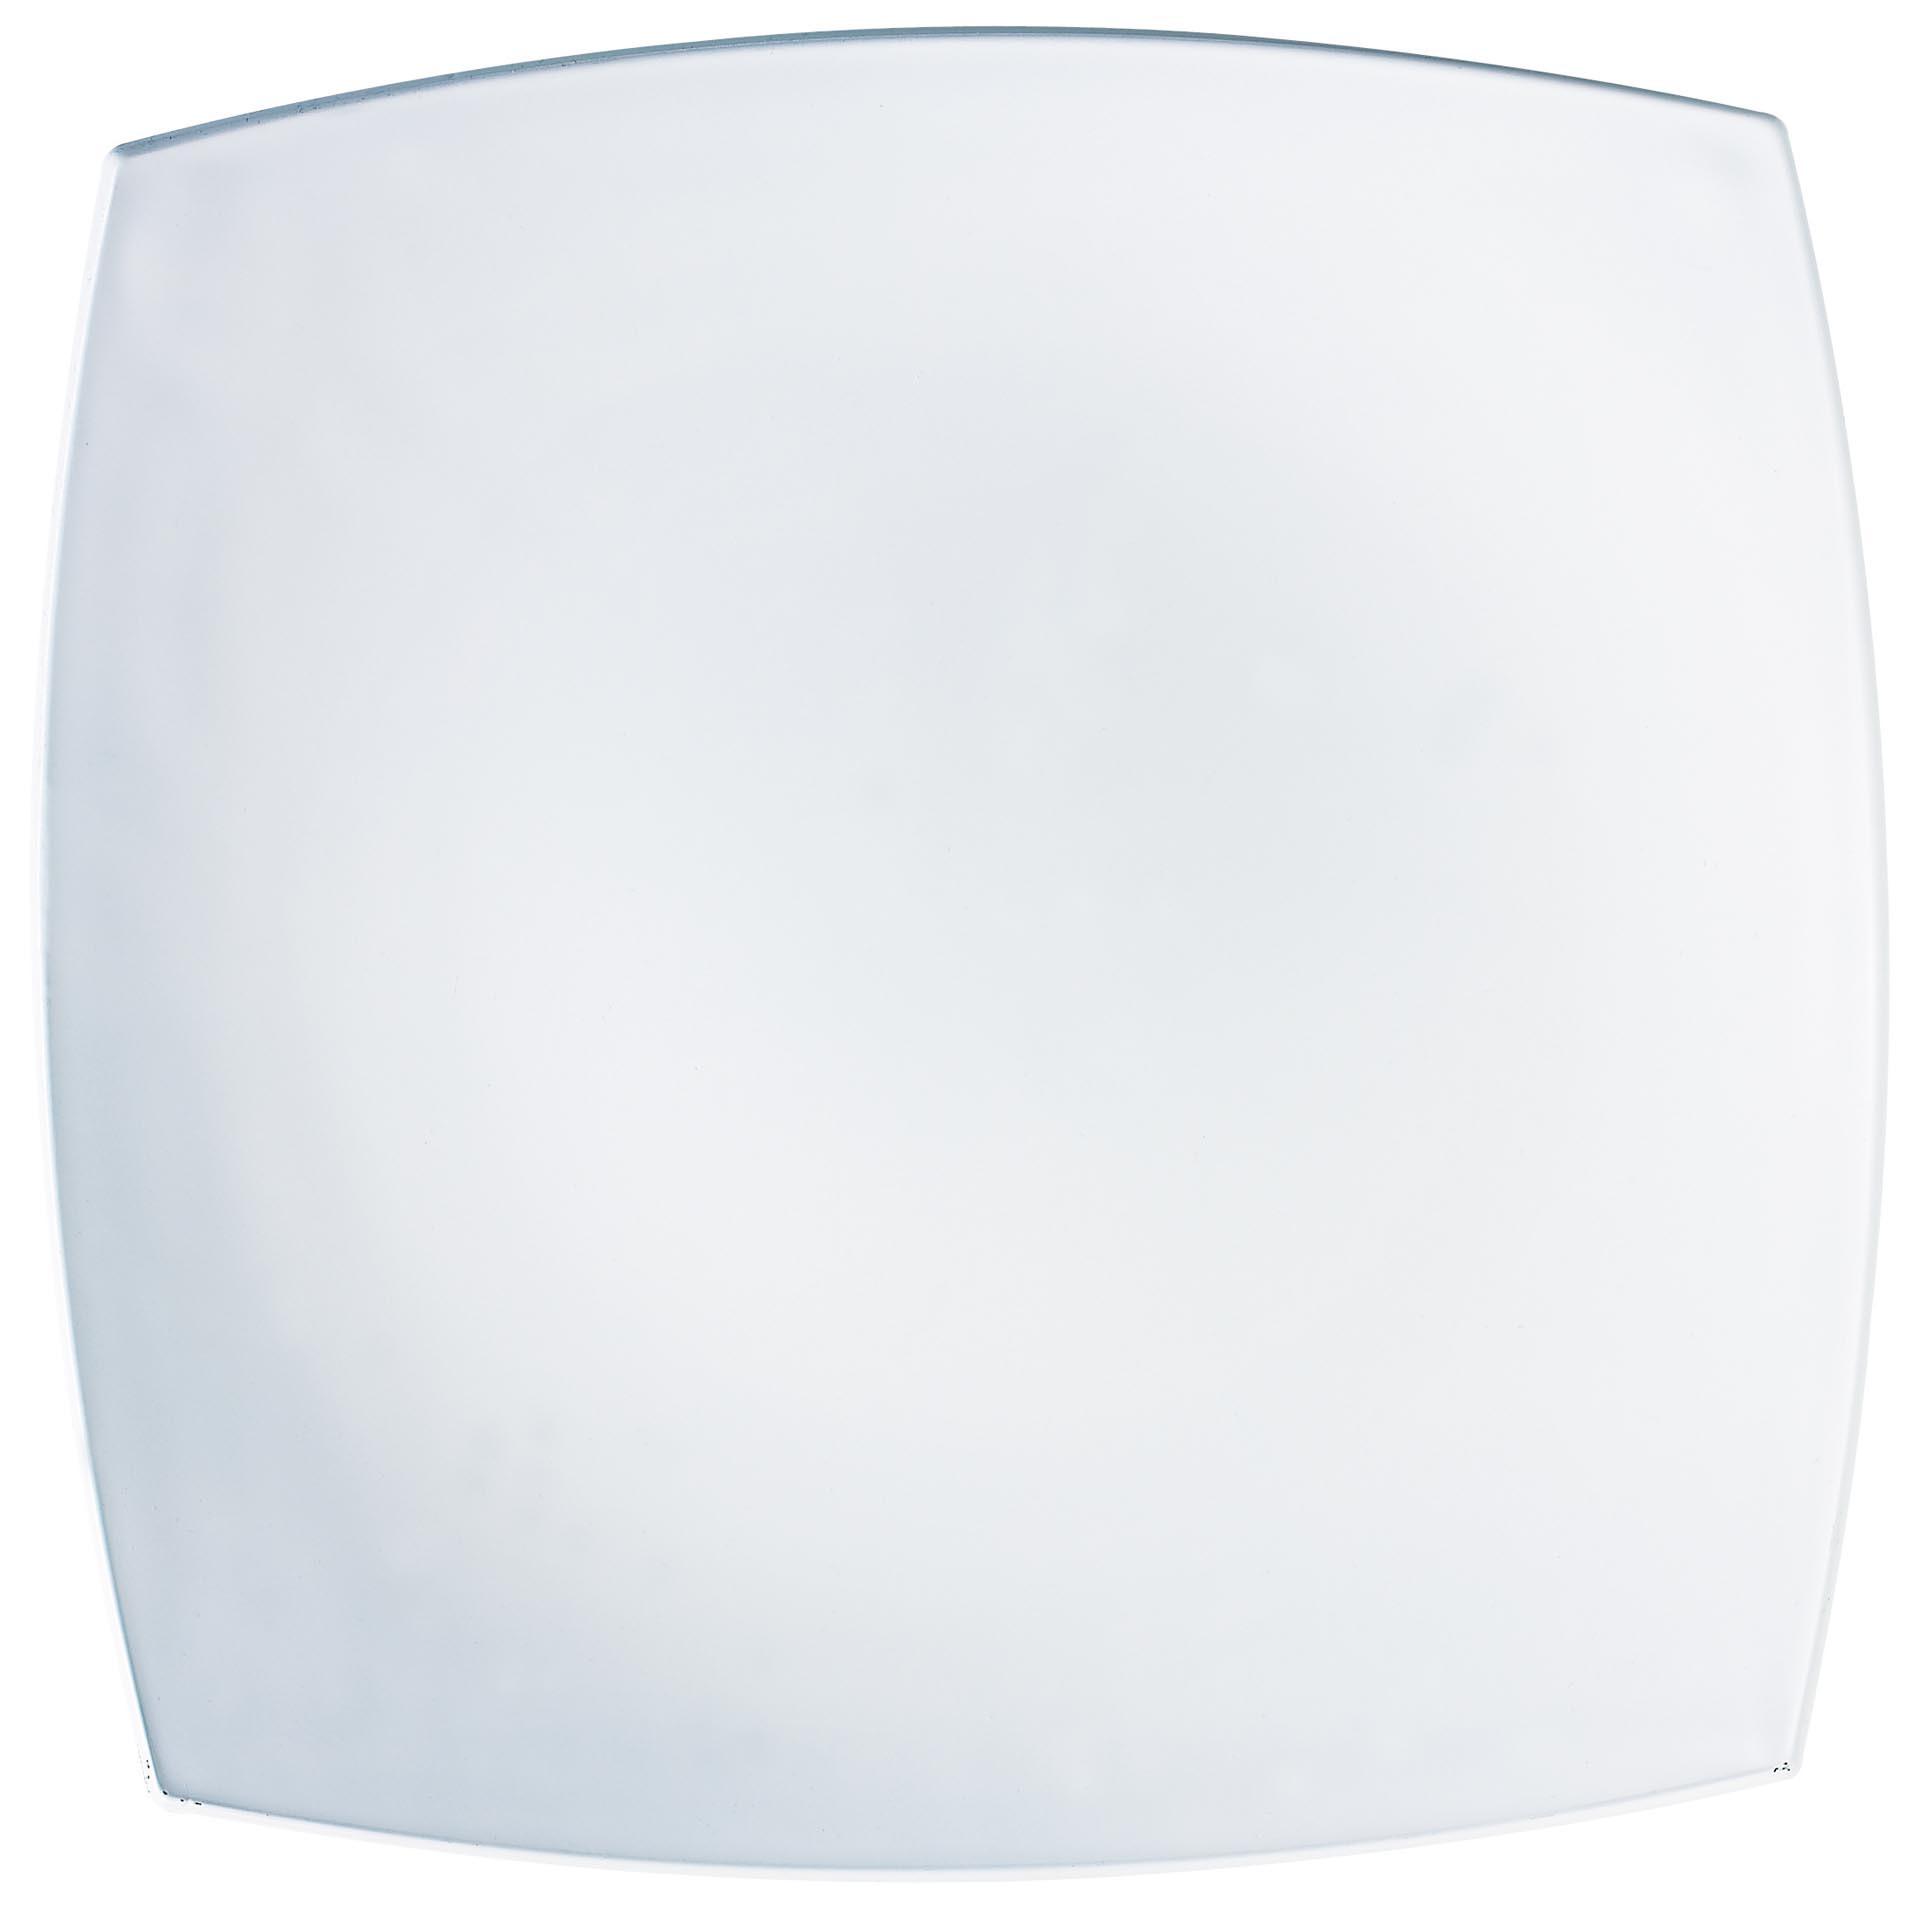 "Hartglas-Teller ""Quadrato"" weiß 27 x 27 cm"